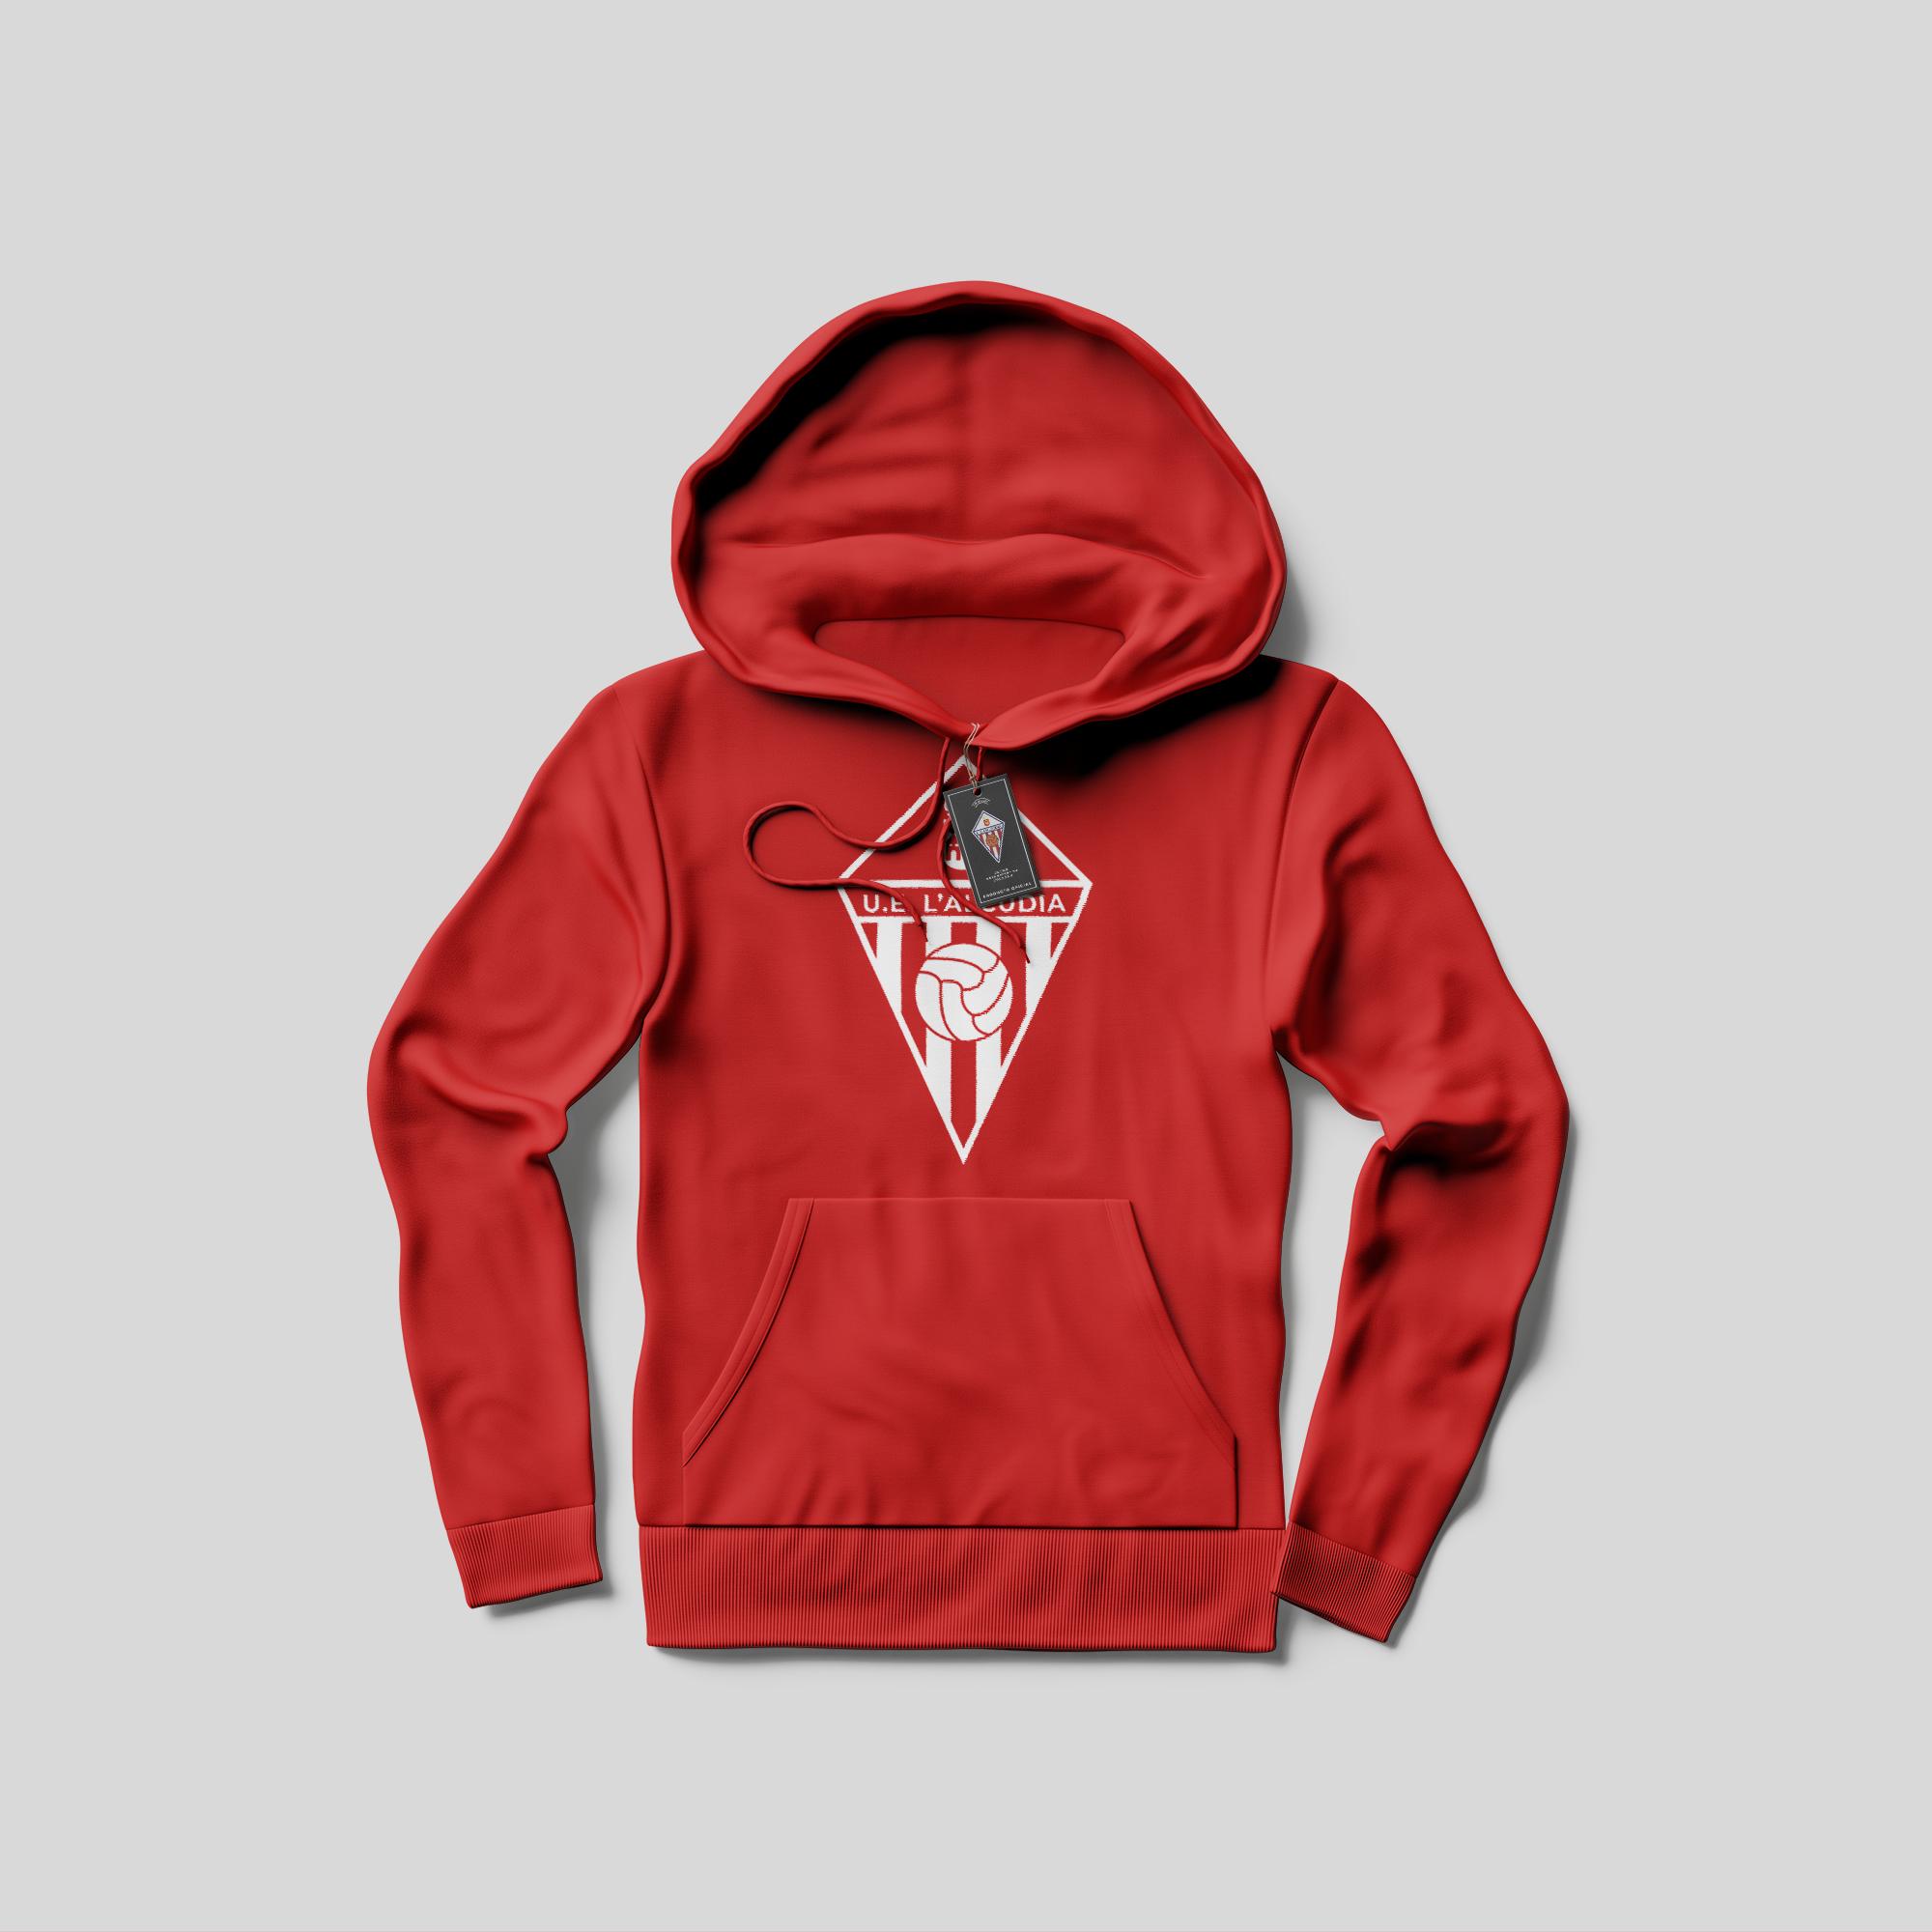 uelalcudia-sudadera-hoodie-red